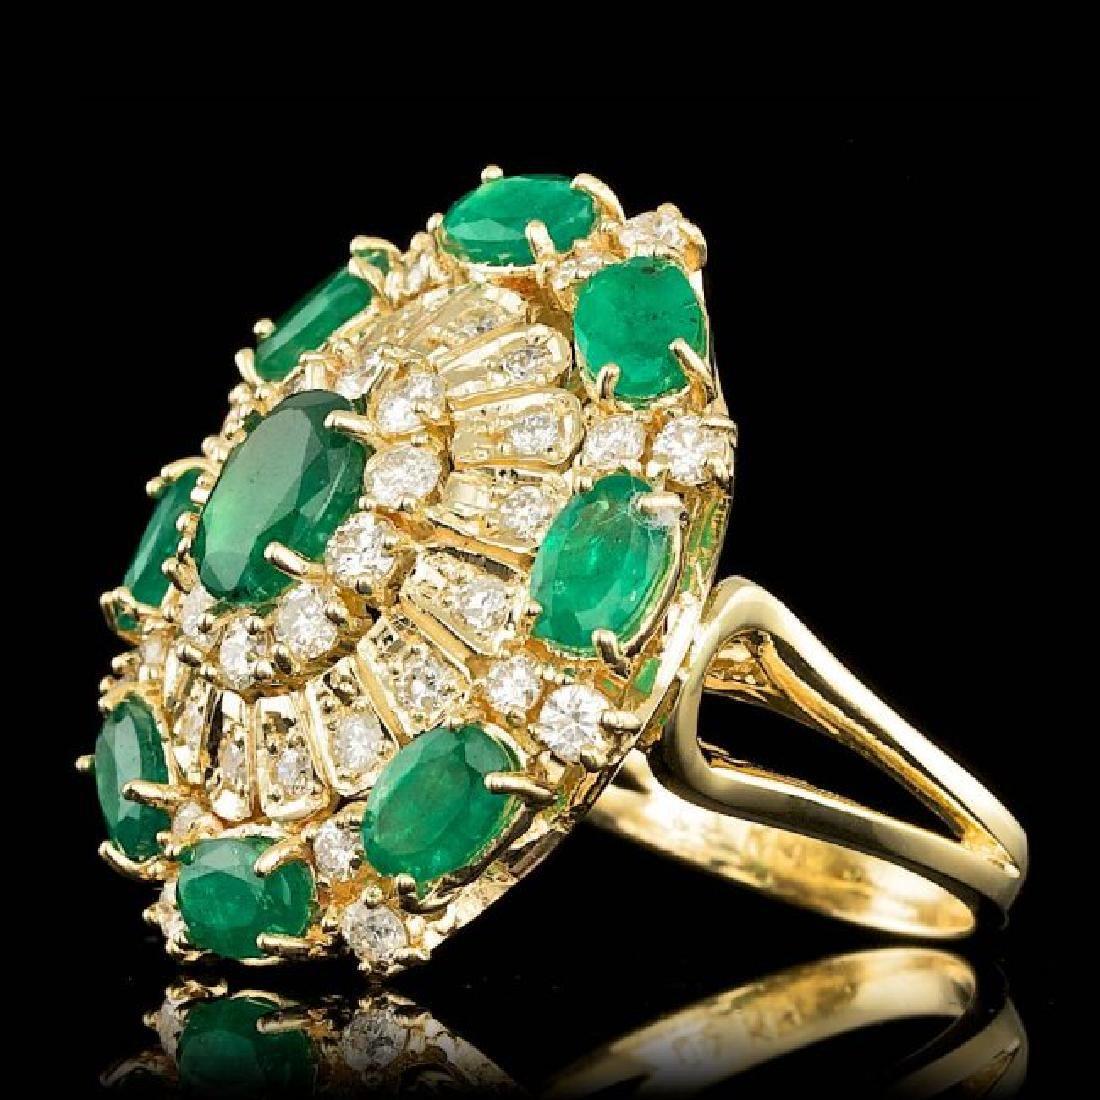 14k Gold 5.00ct Emerald 2.00ct Diamond Ring - 2